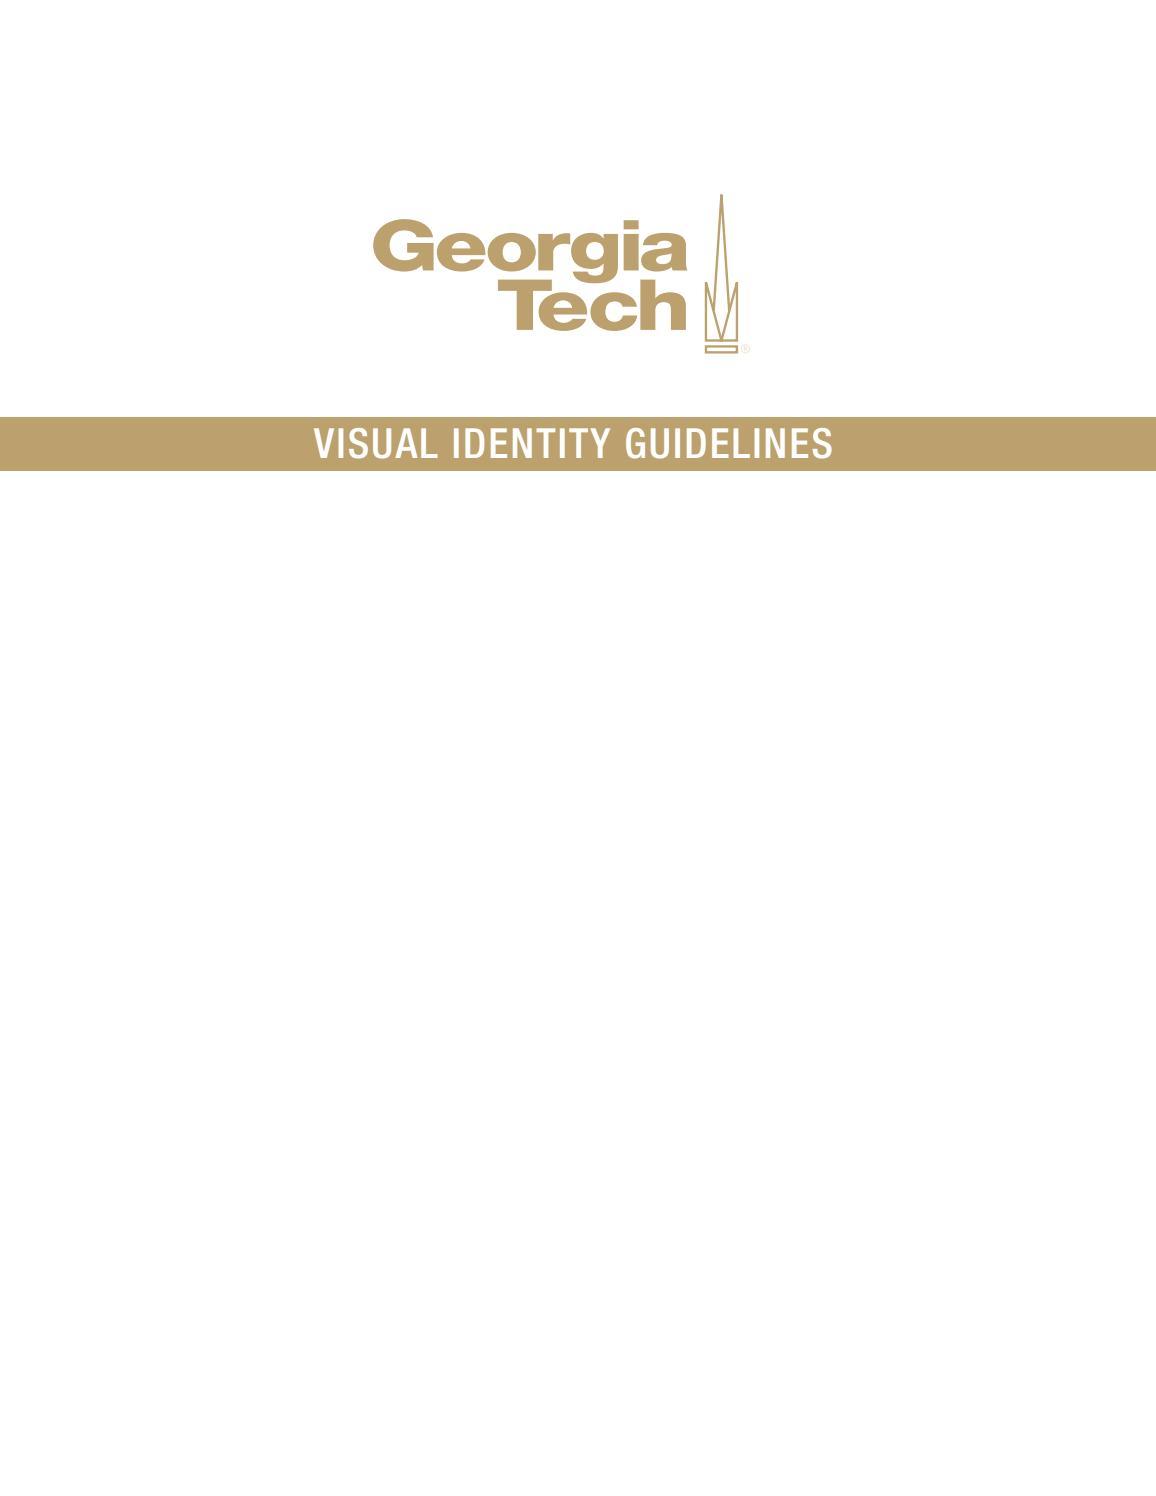 Georgia tech business cards / FOREX Trading